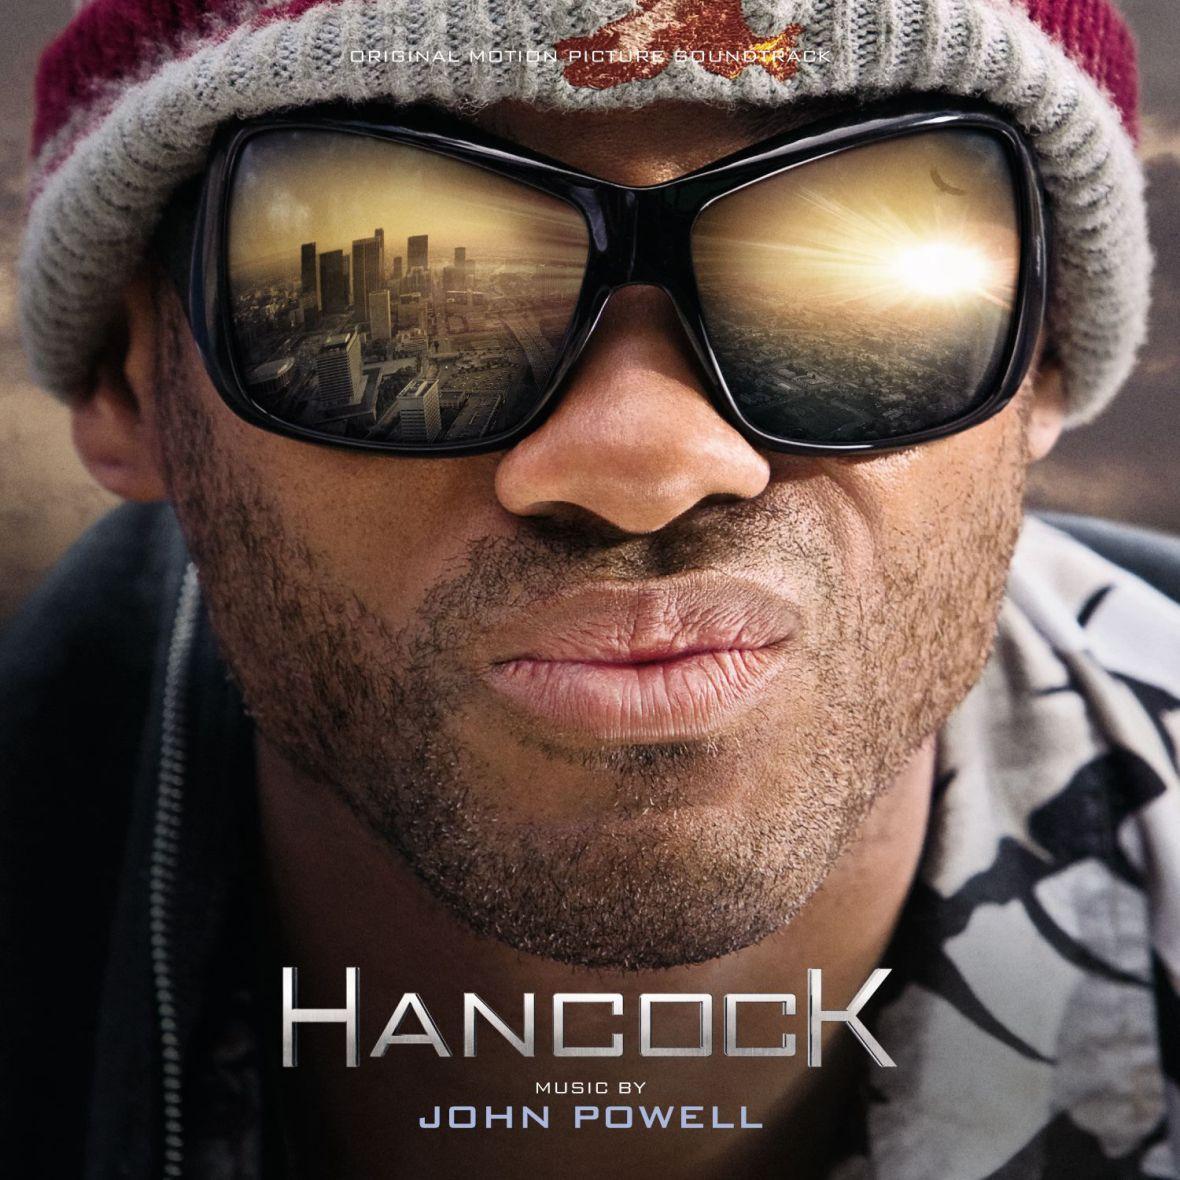 John Powell - Hancock